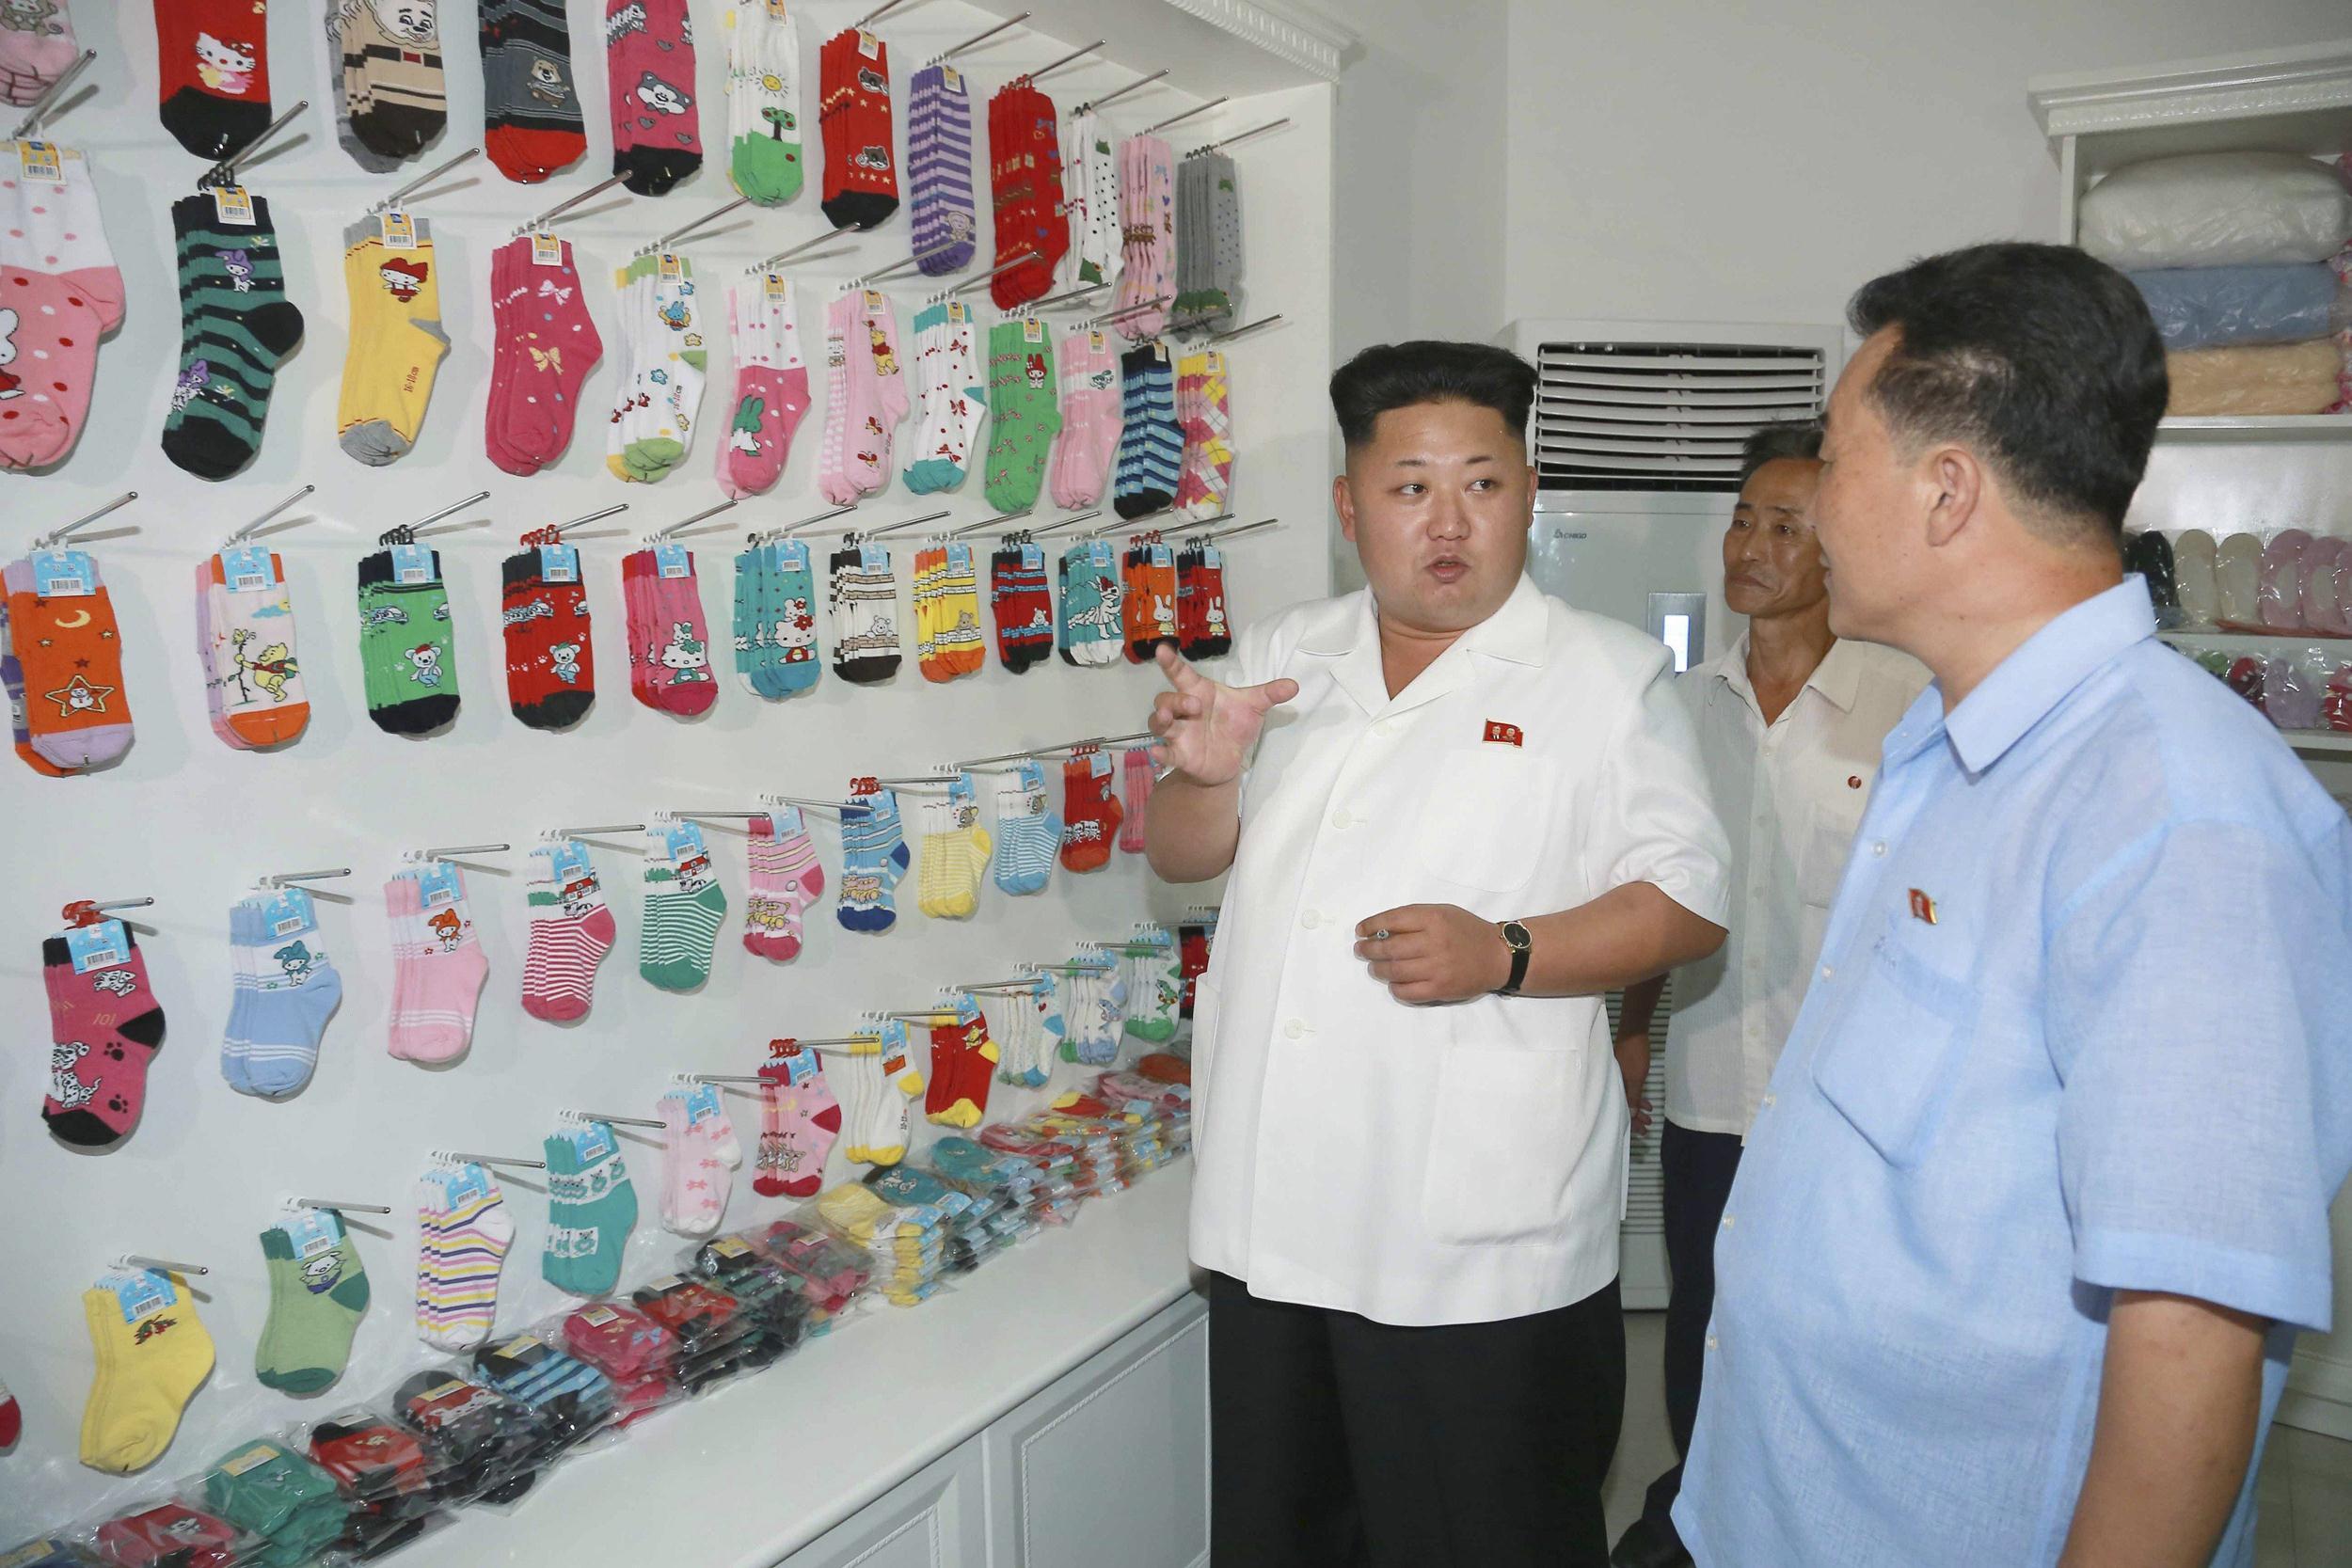 Image: North Korean leader Kim Jong Un visits the Pyongyang Hosiery Factory